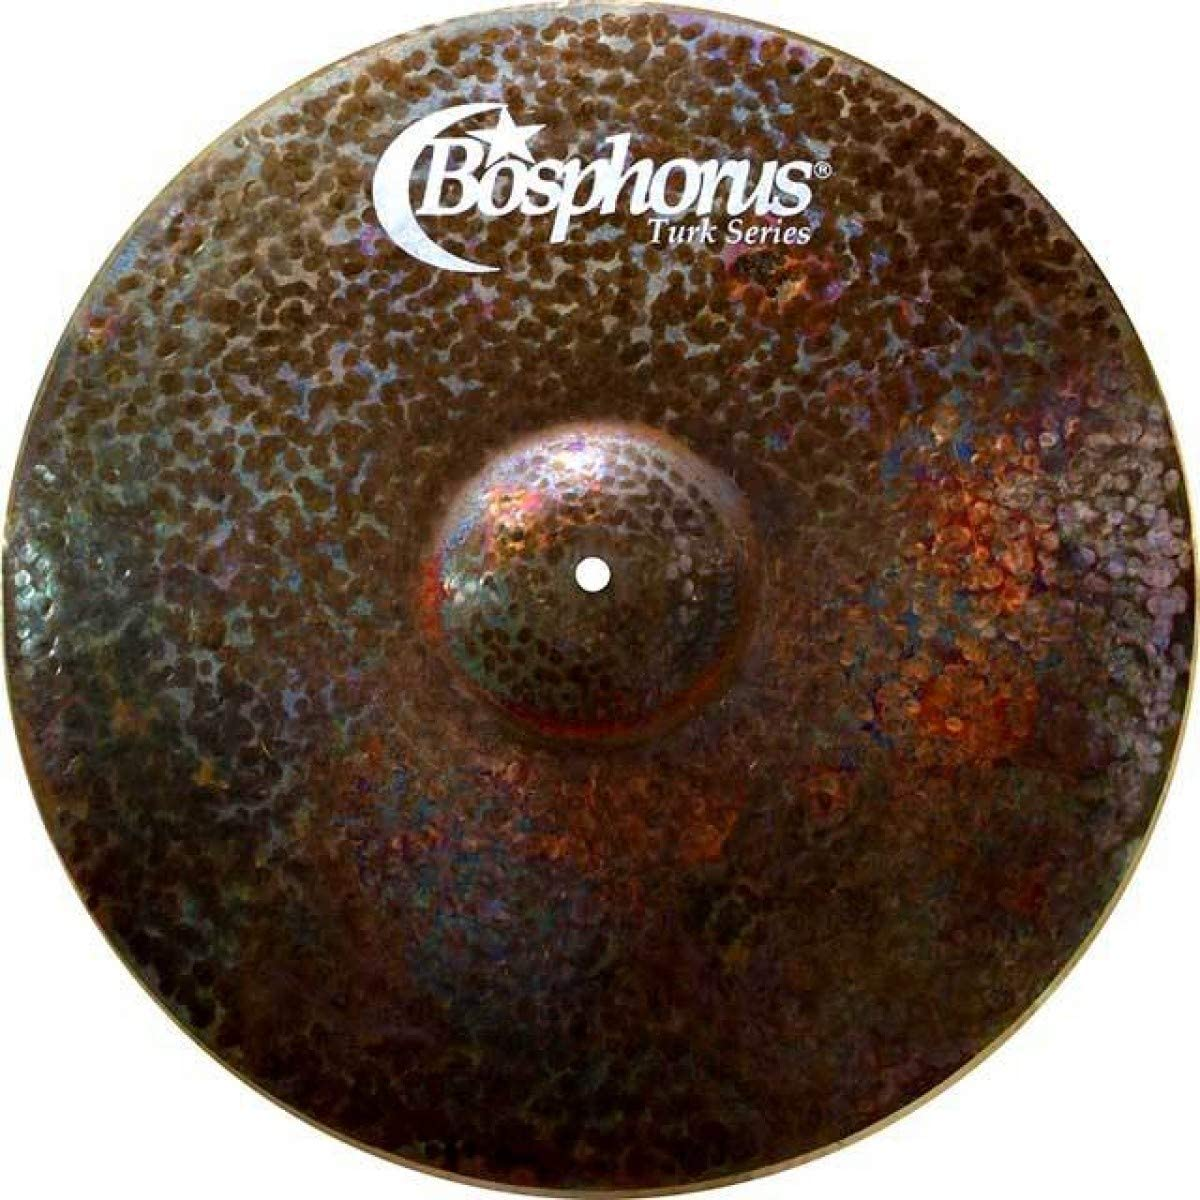 Bosphorus Cymbals K08S 8-Inch Turk Series Splash Cymbal